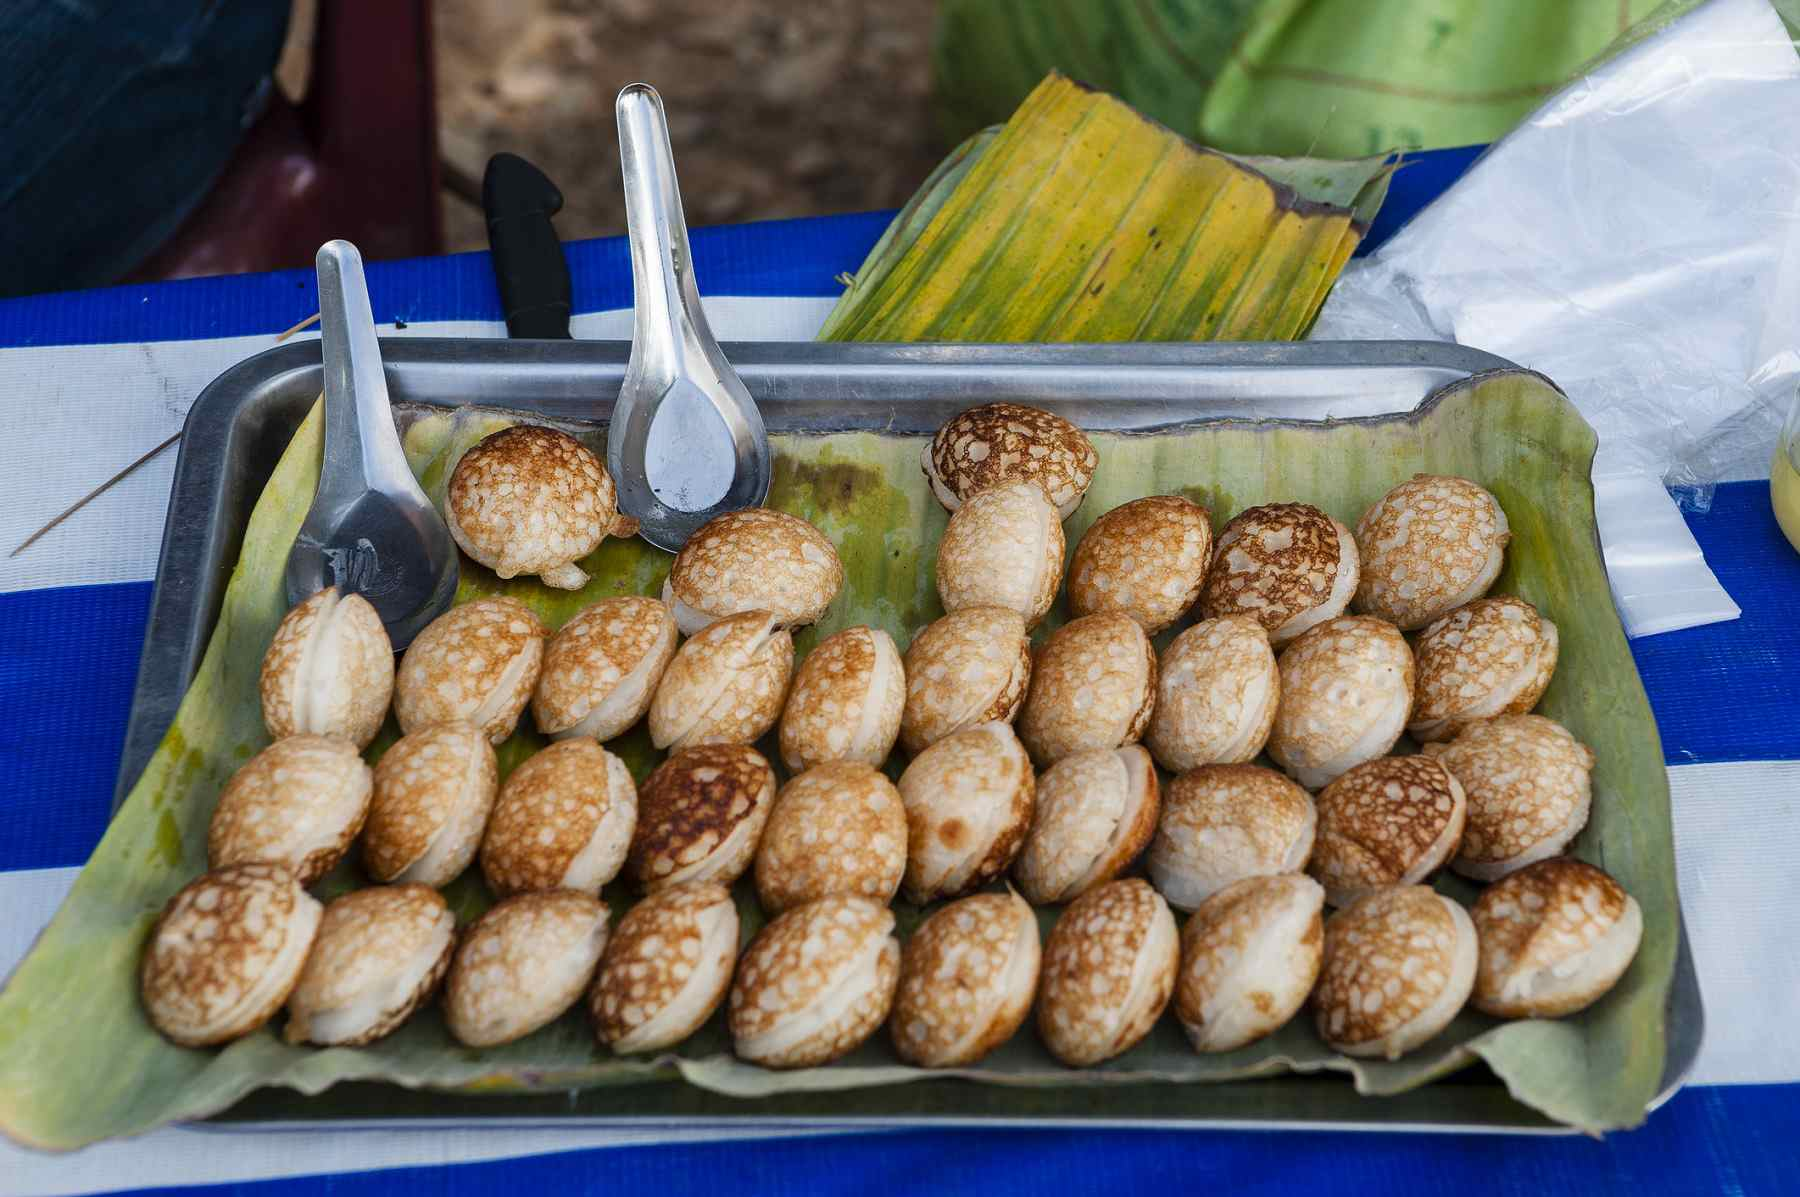 Khao nom kok street food stall, Laos